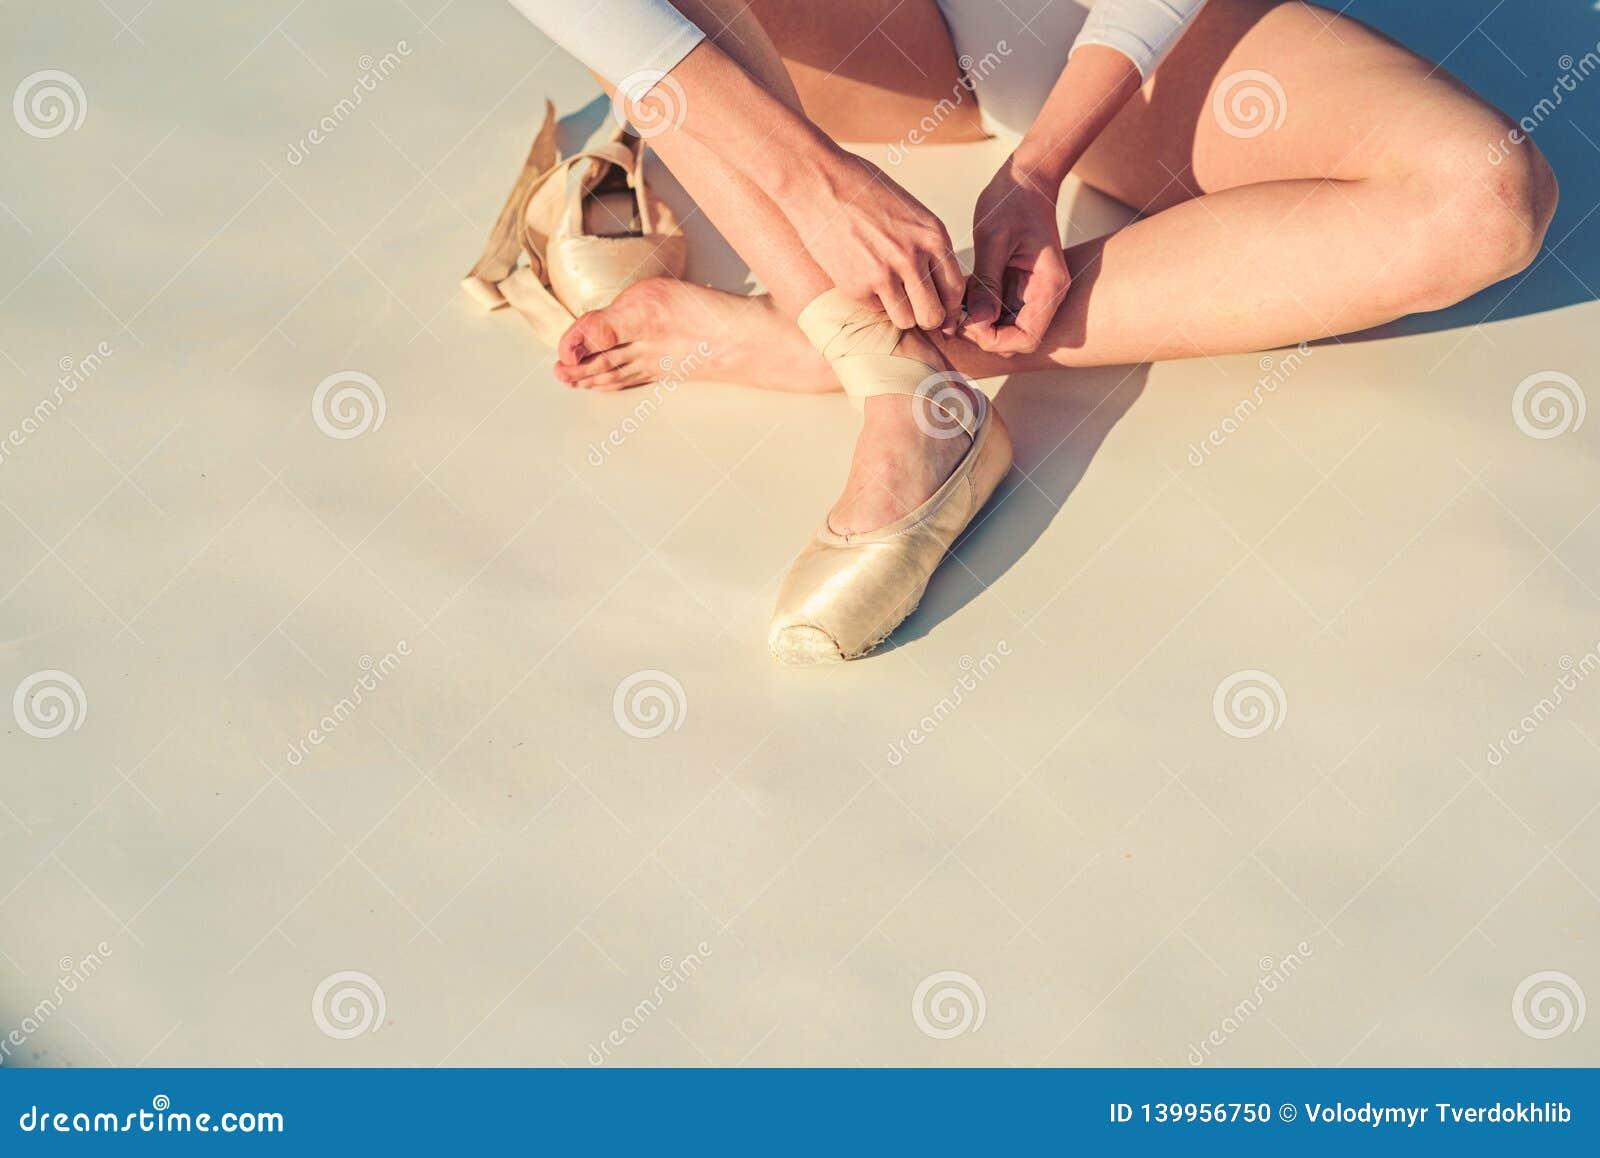 Танцы на pointe Ботинки балерины Ноги балерины в белых ботинках балета Шнуровать тапочки балета Женские ноги в pointe